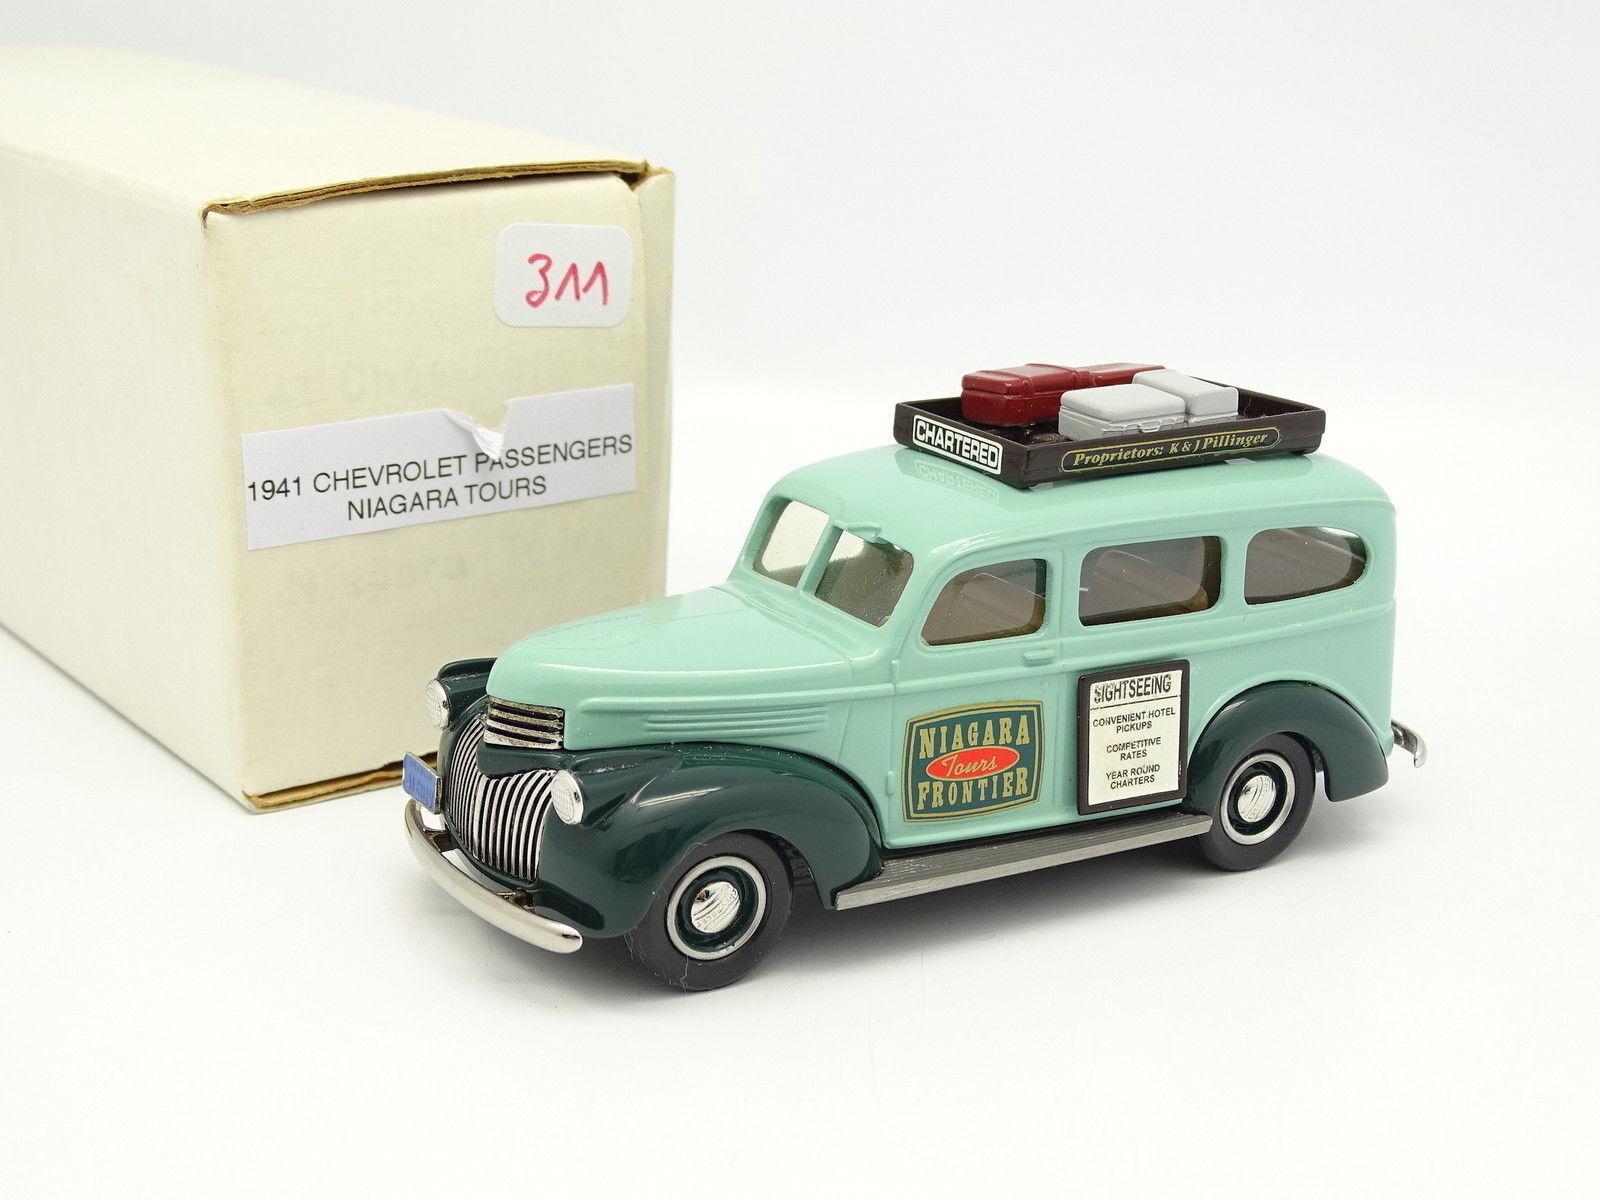 Durham Classics 1/43 - Chevrolet Passengers Niagara Tours 1941